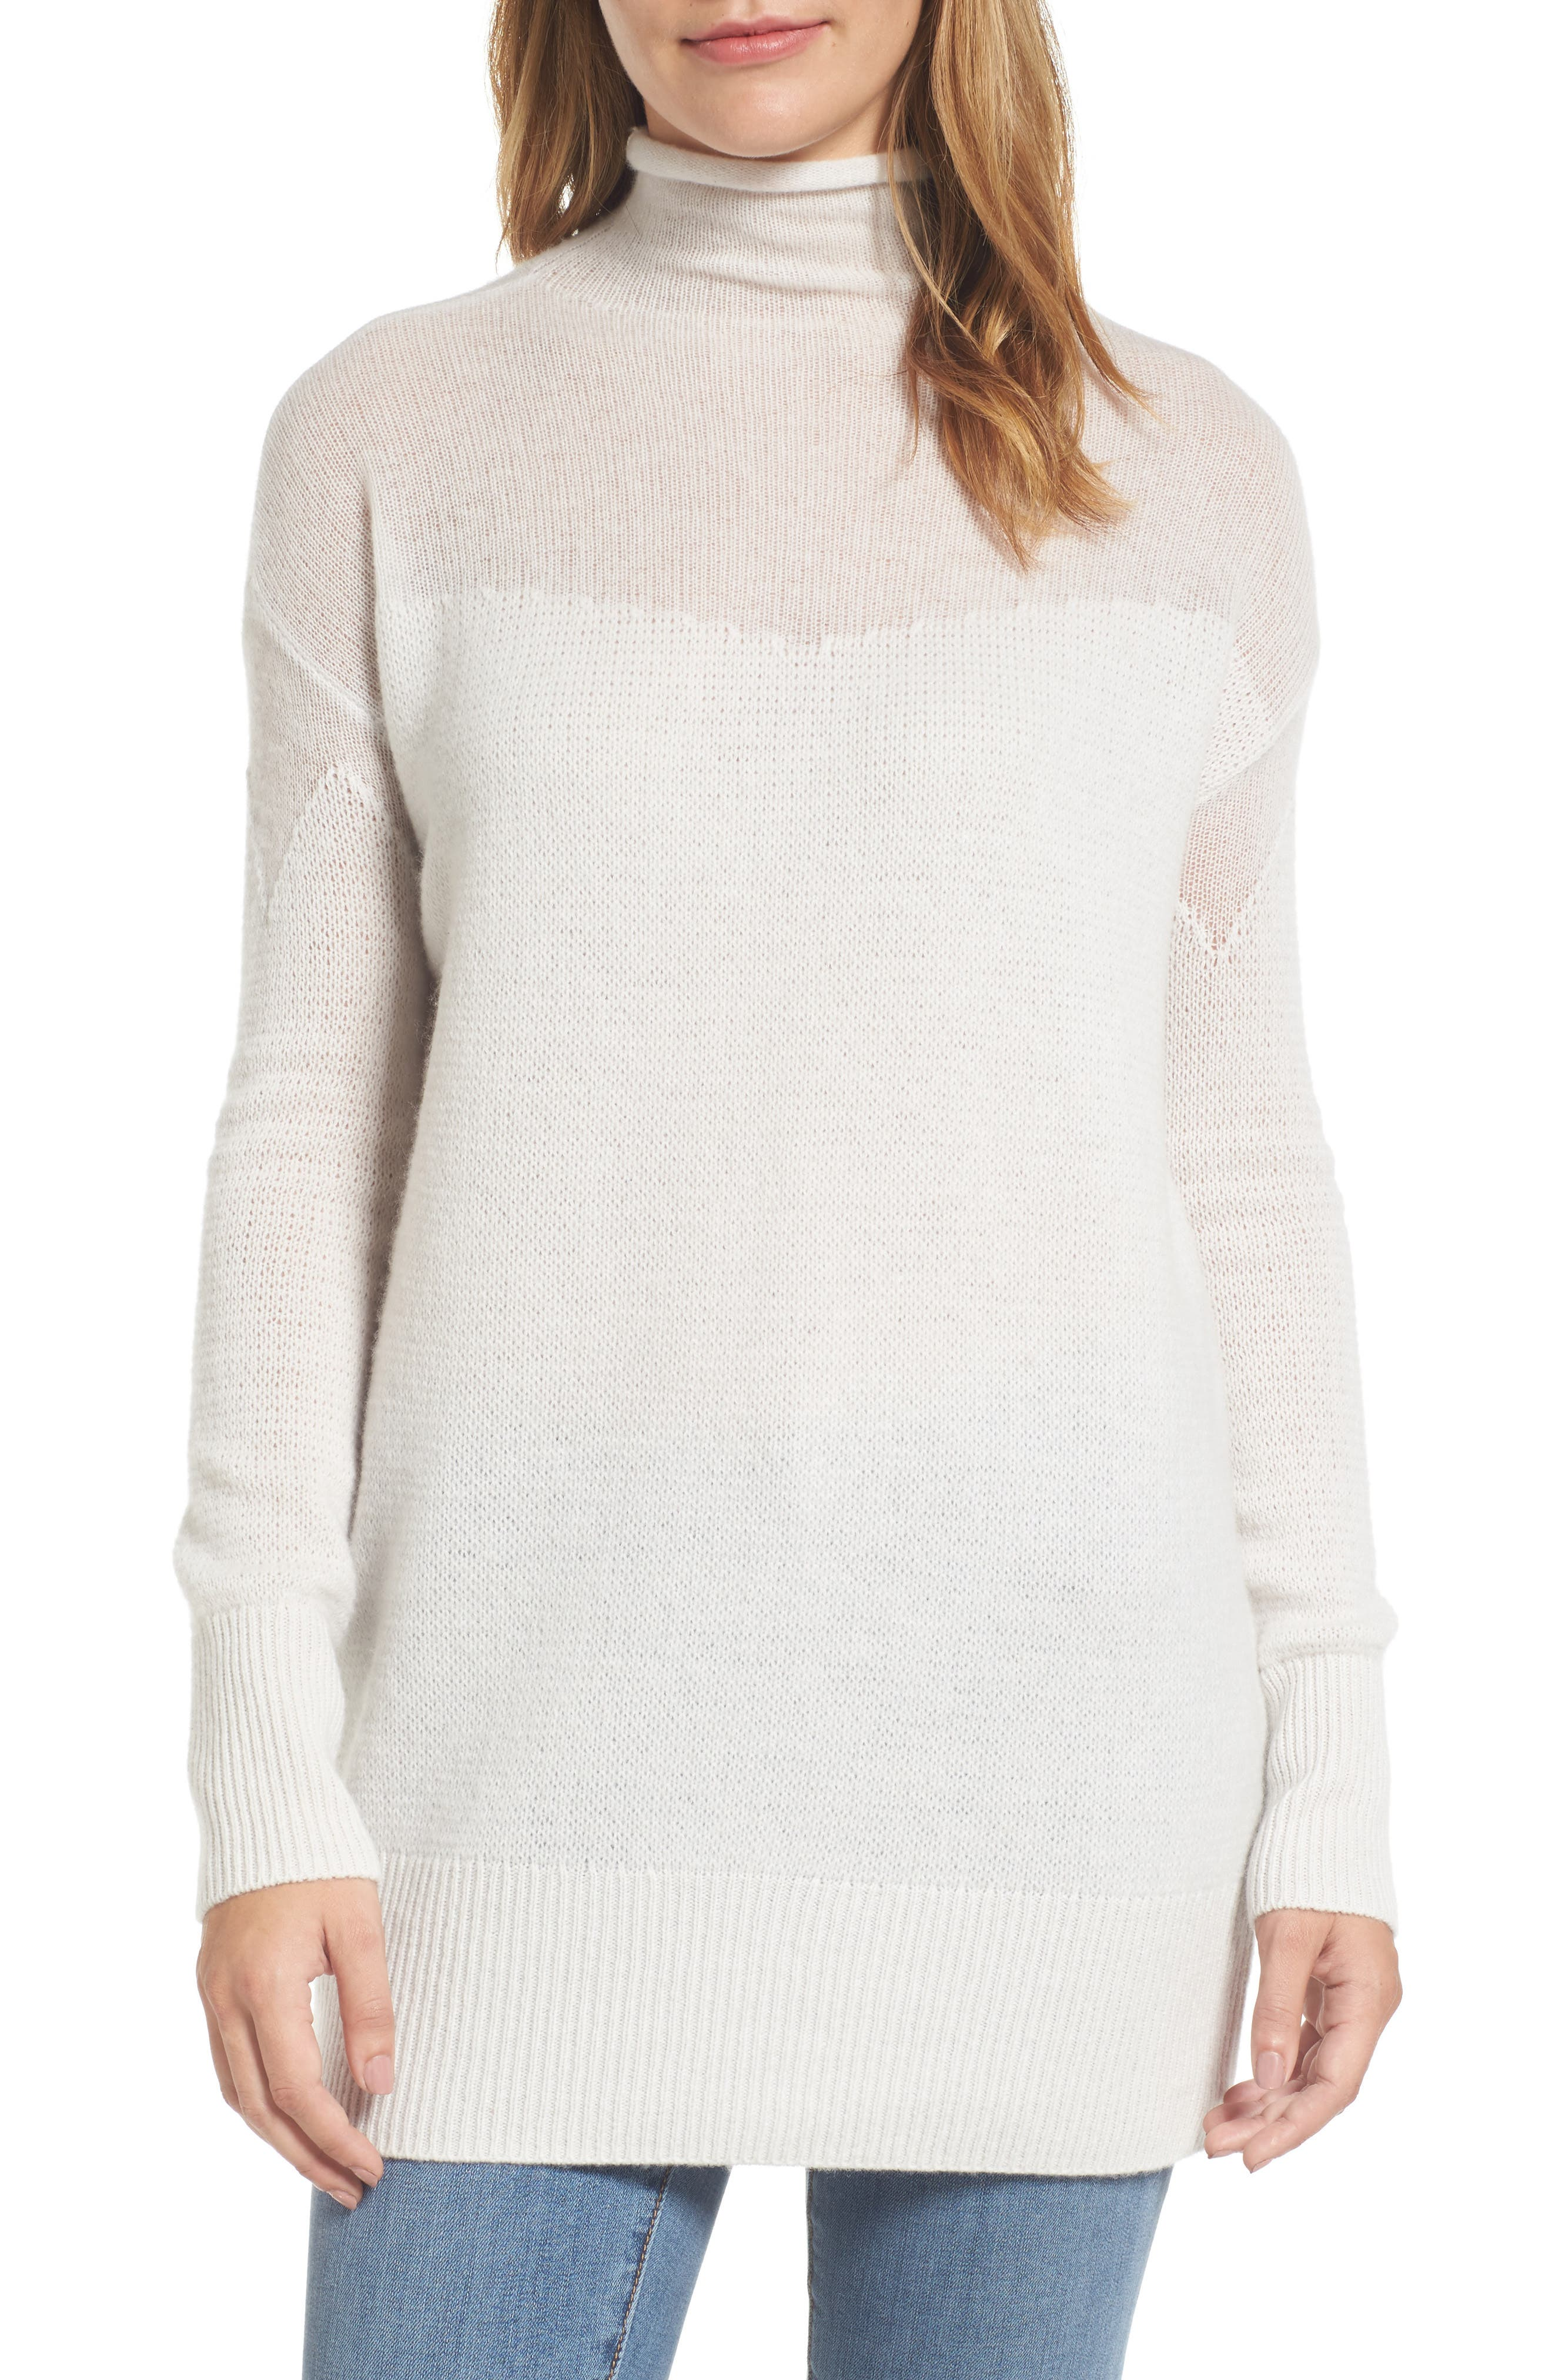 Alternate Image 1 Selected - Halogen® Sheer Yoke Cashmere Sweater (Regular & Petite)